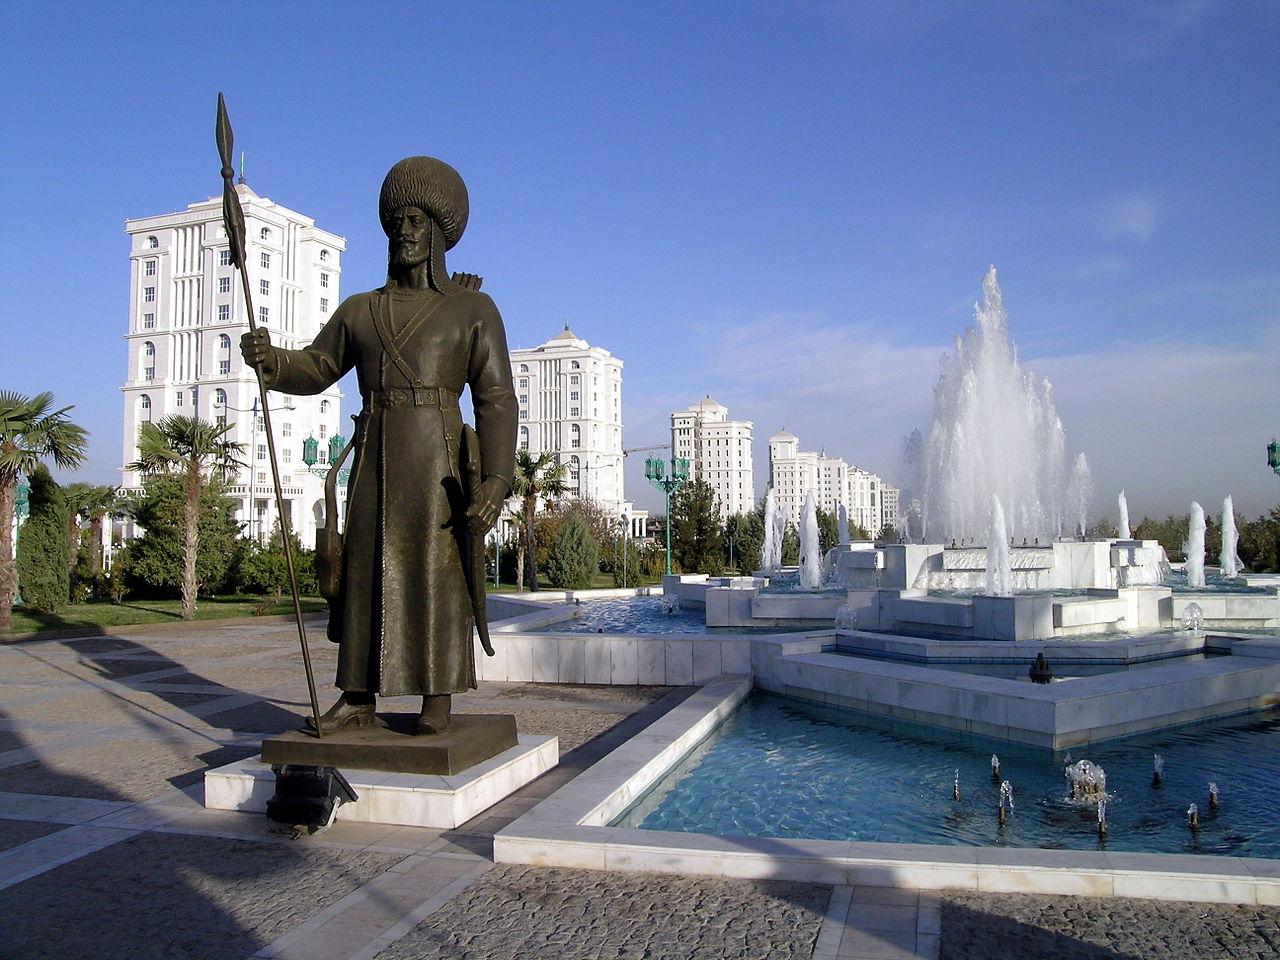 Ašgabat, glavi grad Turkmenistana je potpuno besmislen sudeći po rečima Vaska Lukinića. Foto: Michael Karavanov, Wikimedia